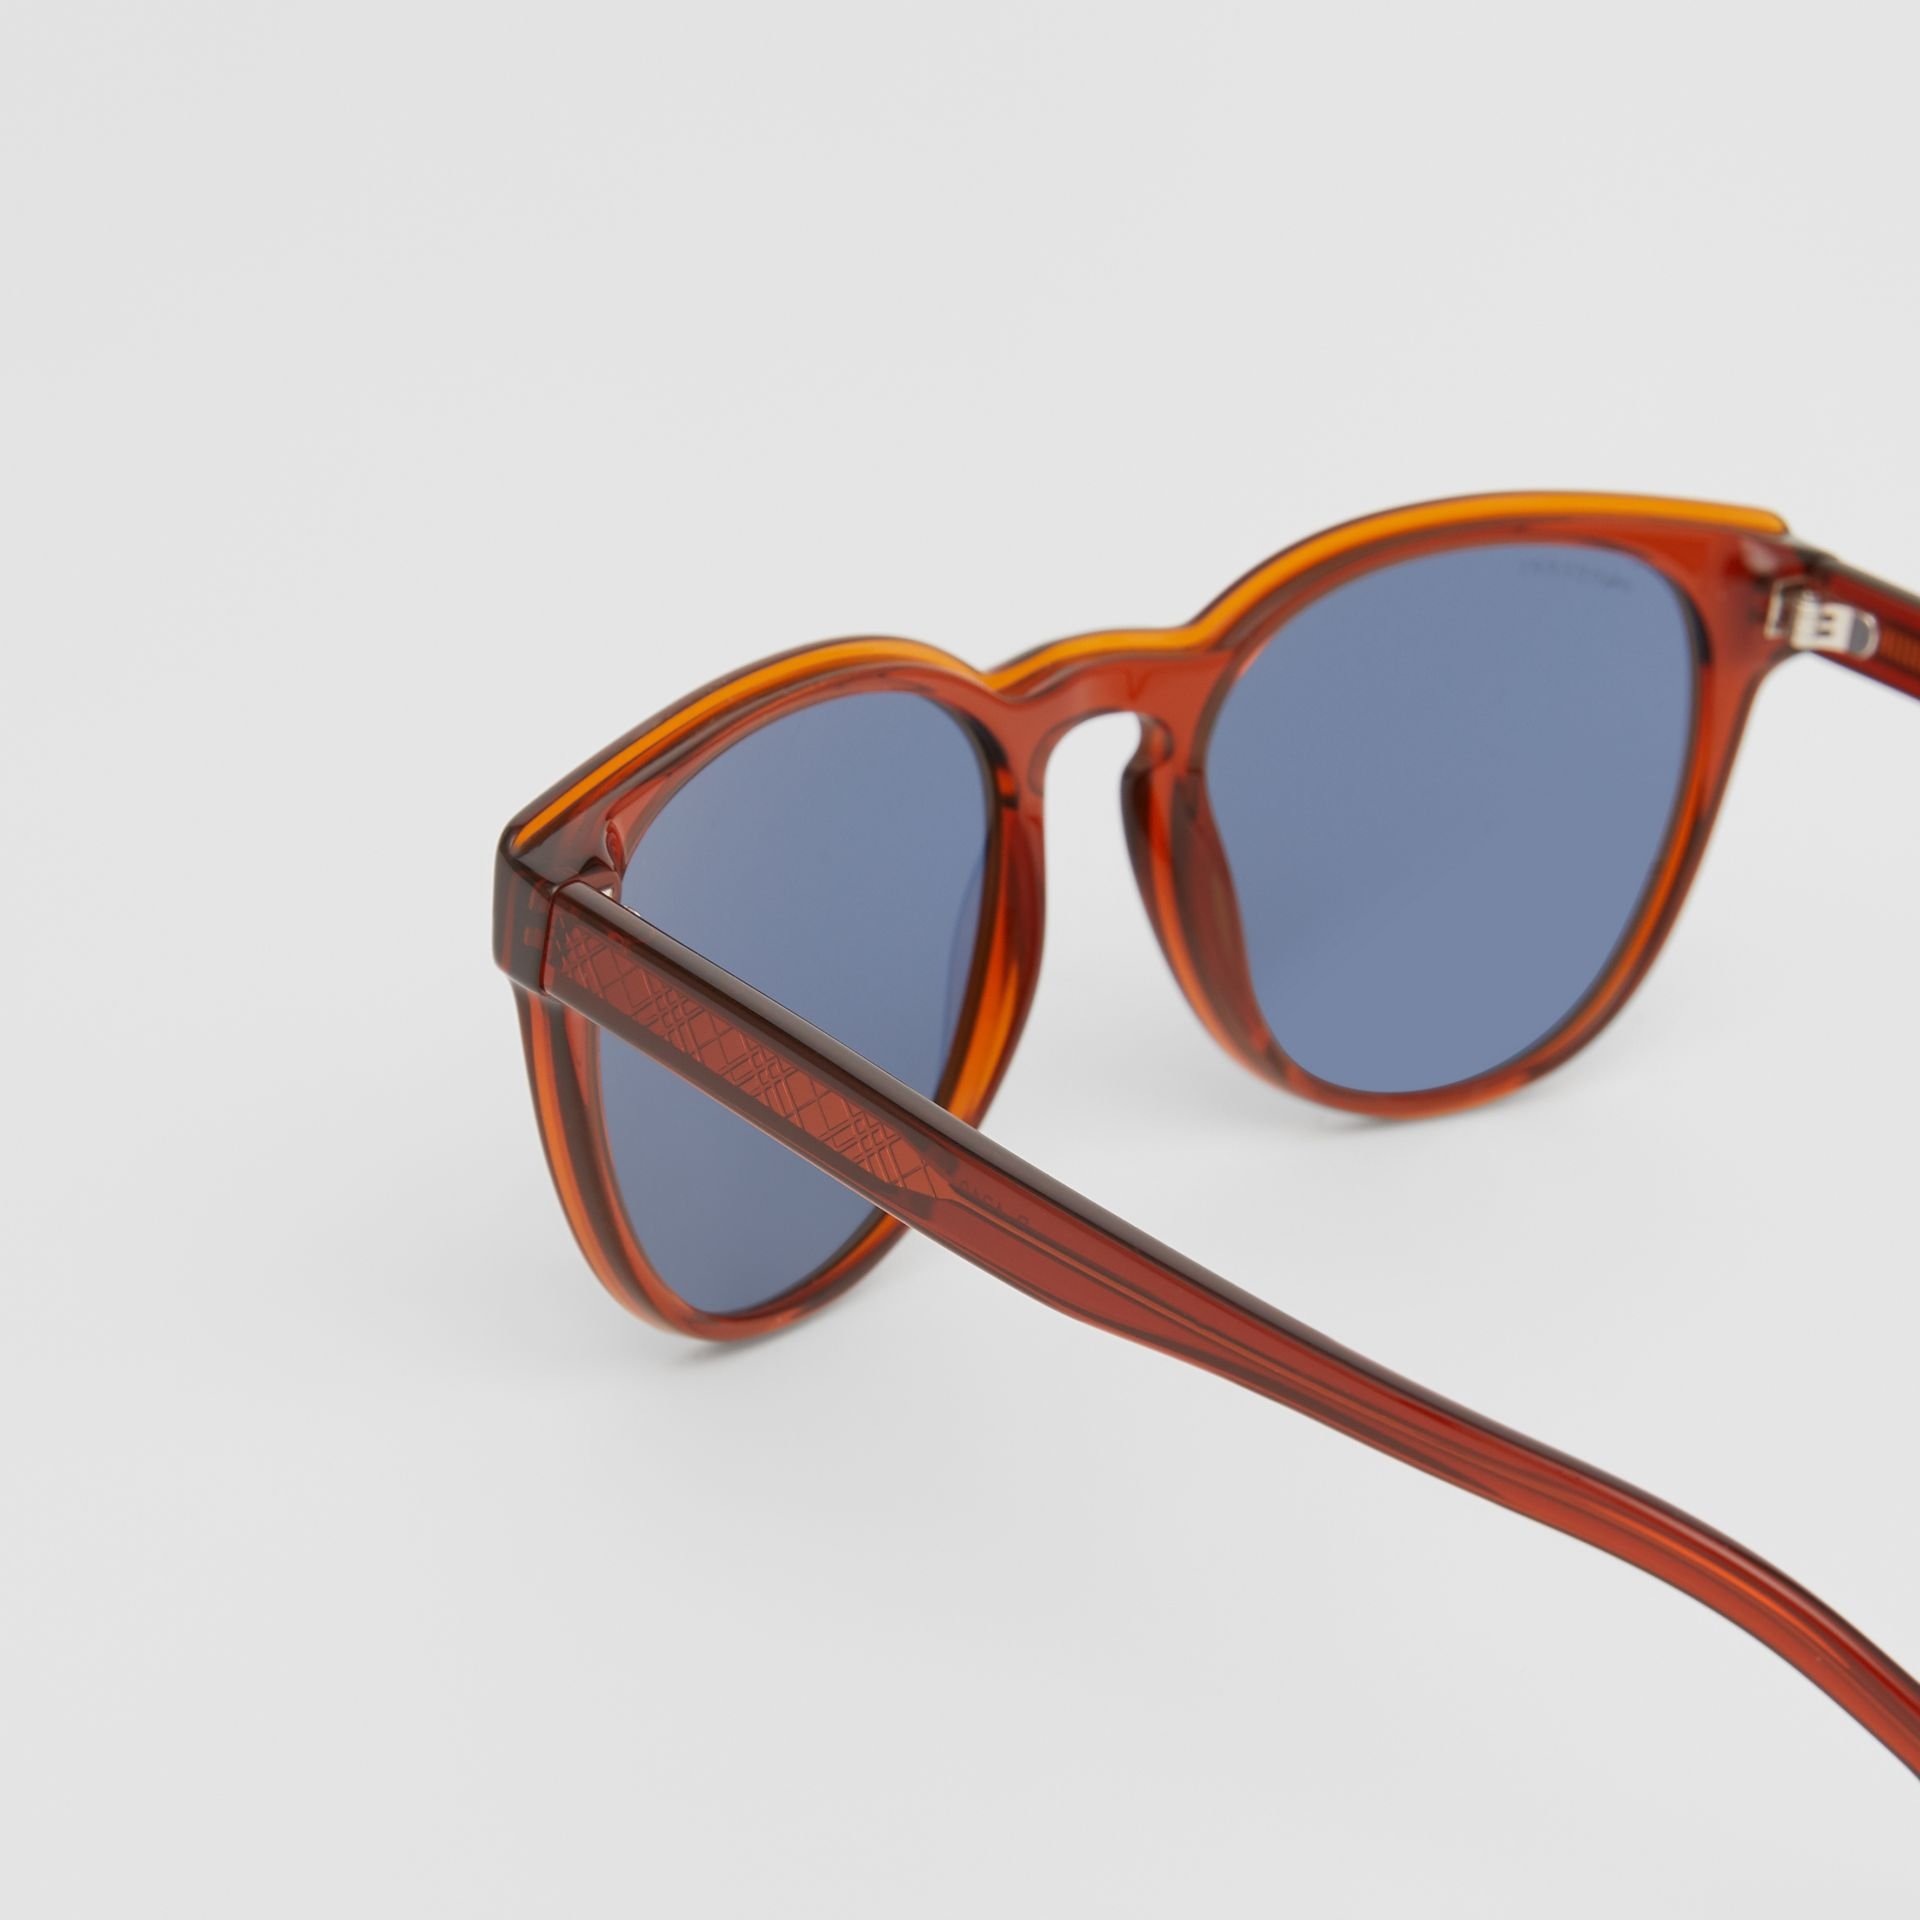 Round Frame Sunglasses in Amber - Men | Burberry Australia - gallery image 1